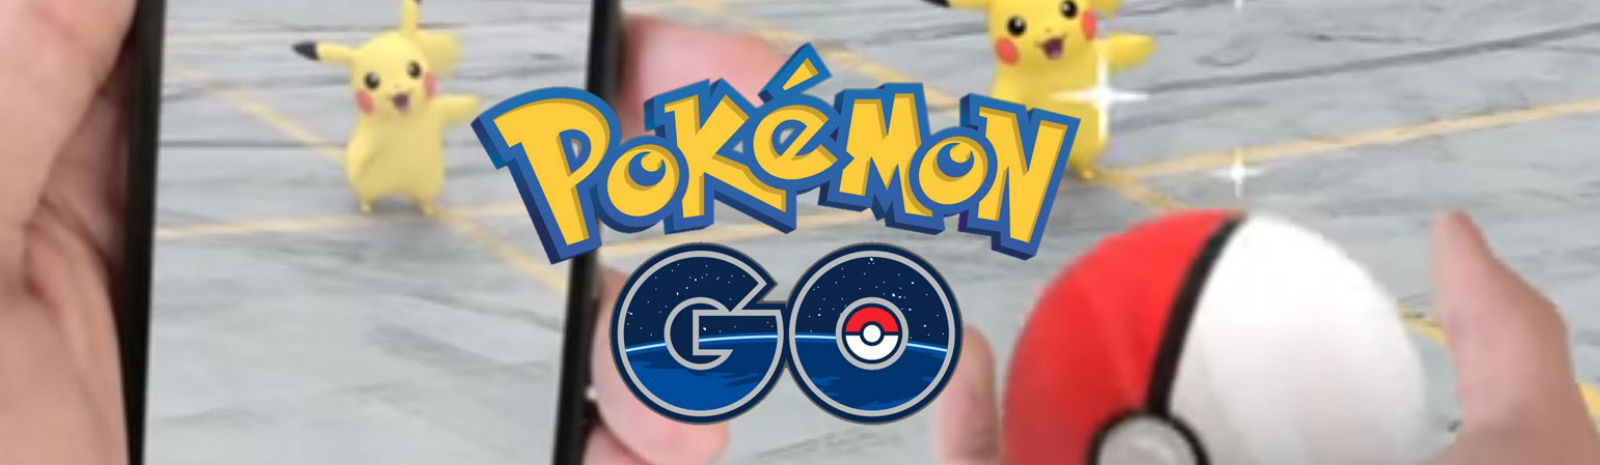 McDonald´s, a primeira marca no Pokémon Go!